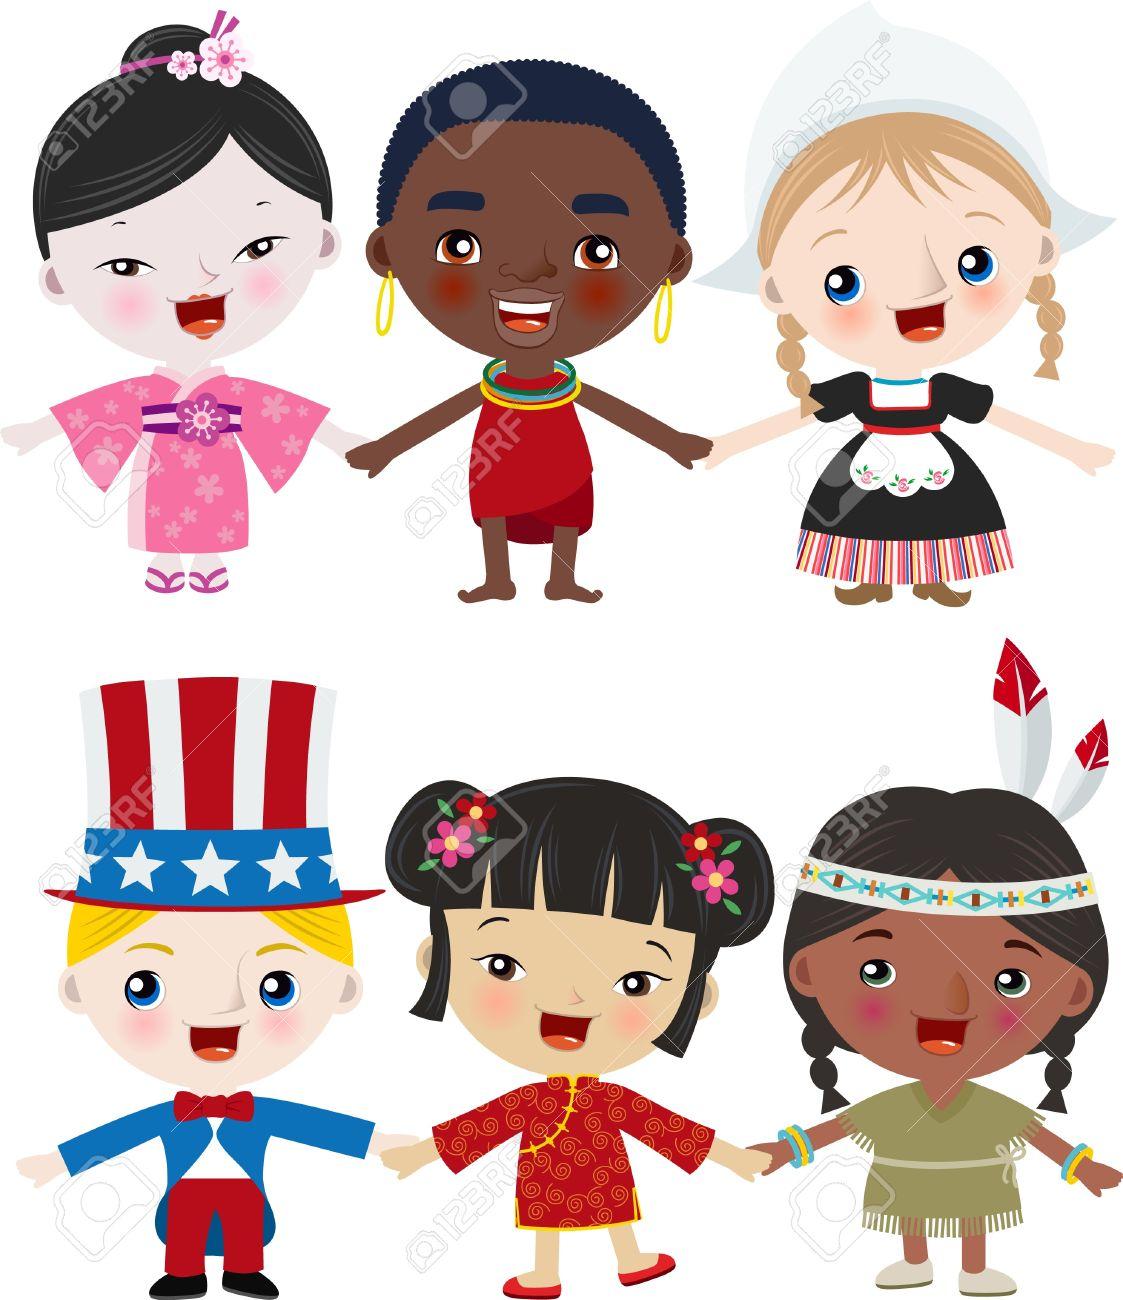 Multicutural Kids Stock Vector - 14099479